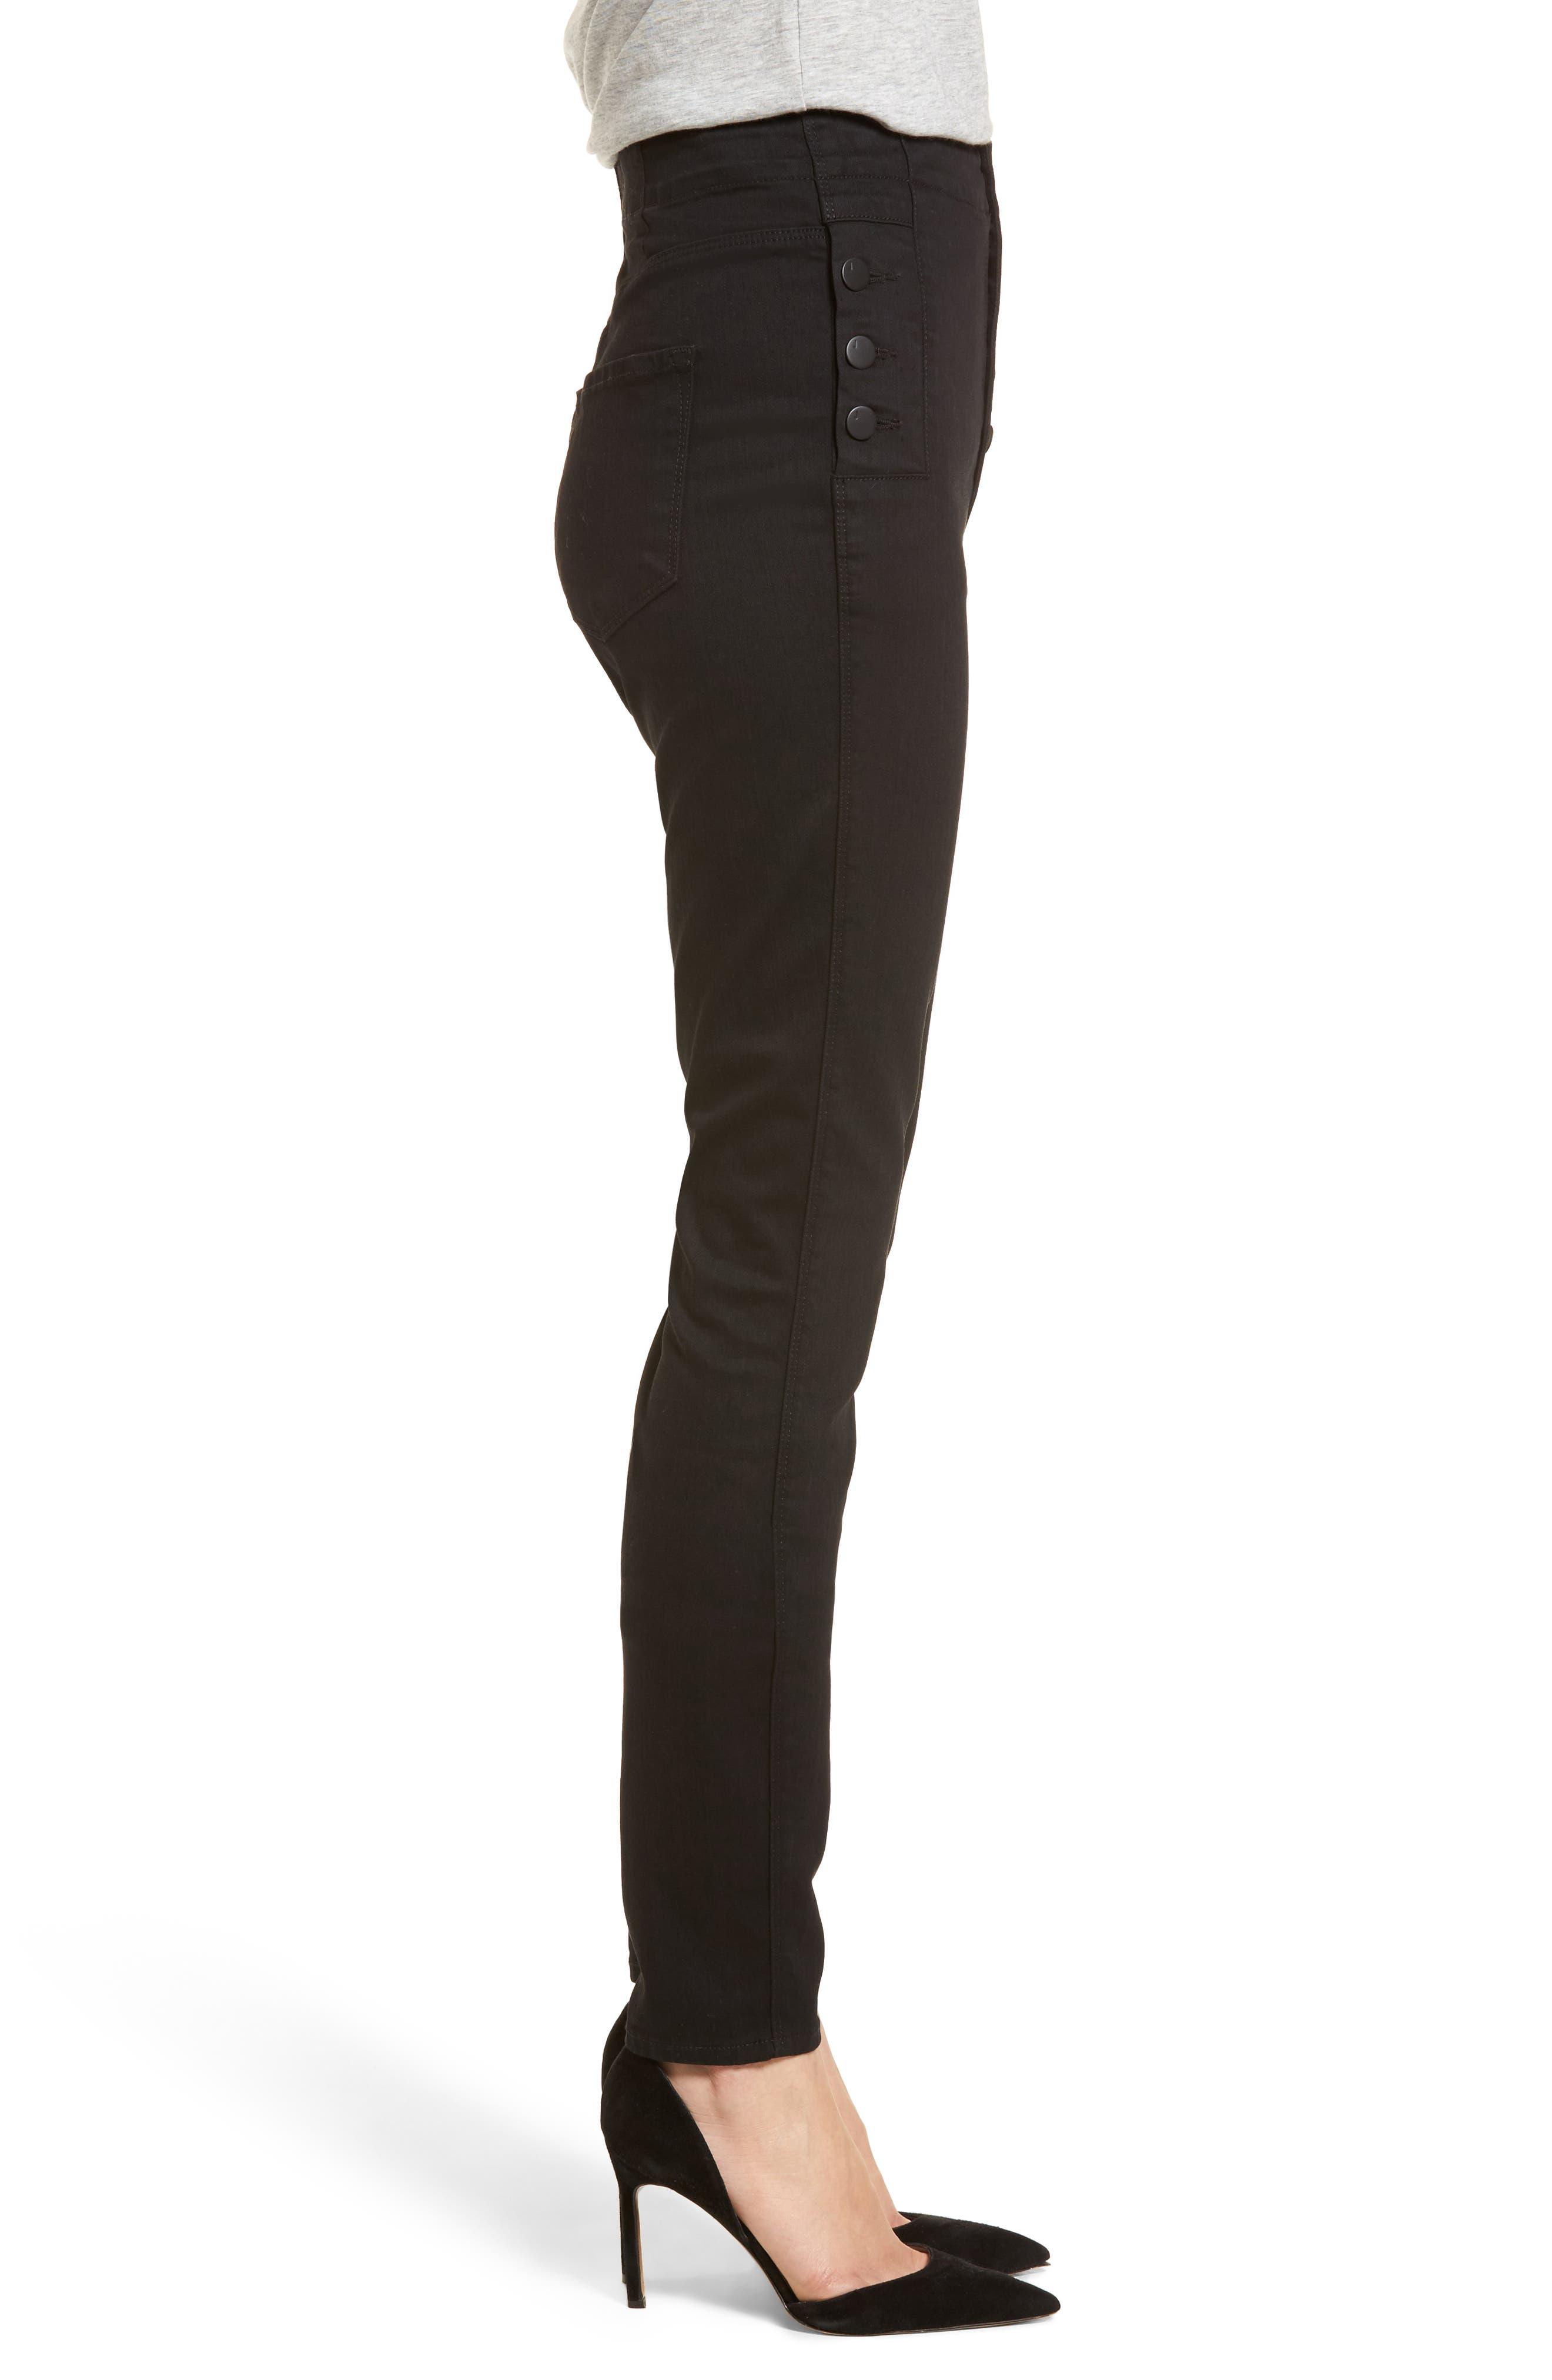 Natasha Photoready High Waist Skinny Jeans,                             Alternate thumbnail 3, color,                             VANITY